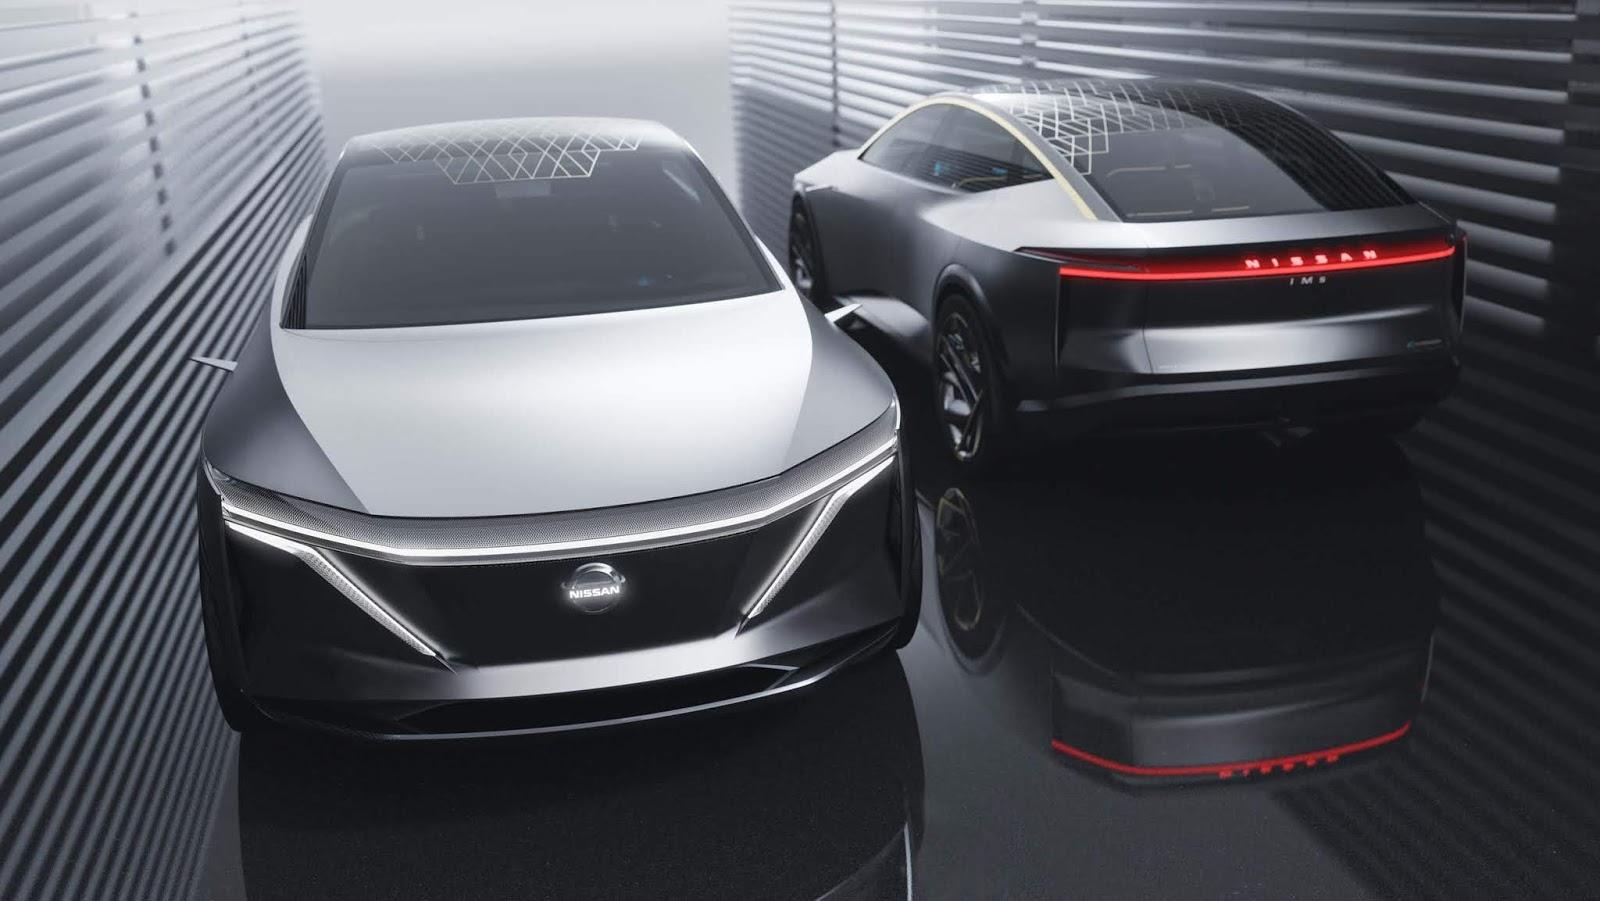 Nissan2BIMs2B2528112529 Σου αρέσει το τετρακίνητο σπορ σεντάν της Nissan; Electric cars, Nissan, video, videos, zblog, αυτόνομα, Αυτόνομη οδήγηση, βίντεο, τετρακίνητα, τετρακίνητο